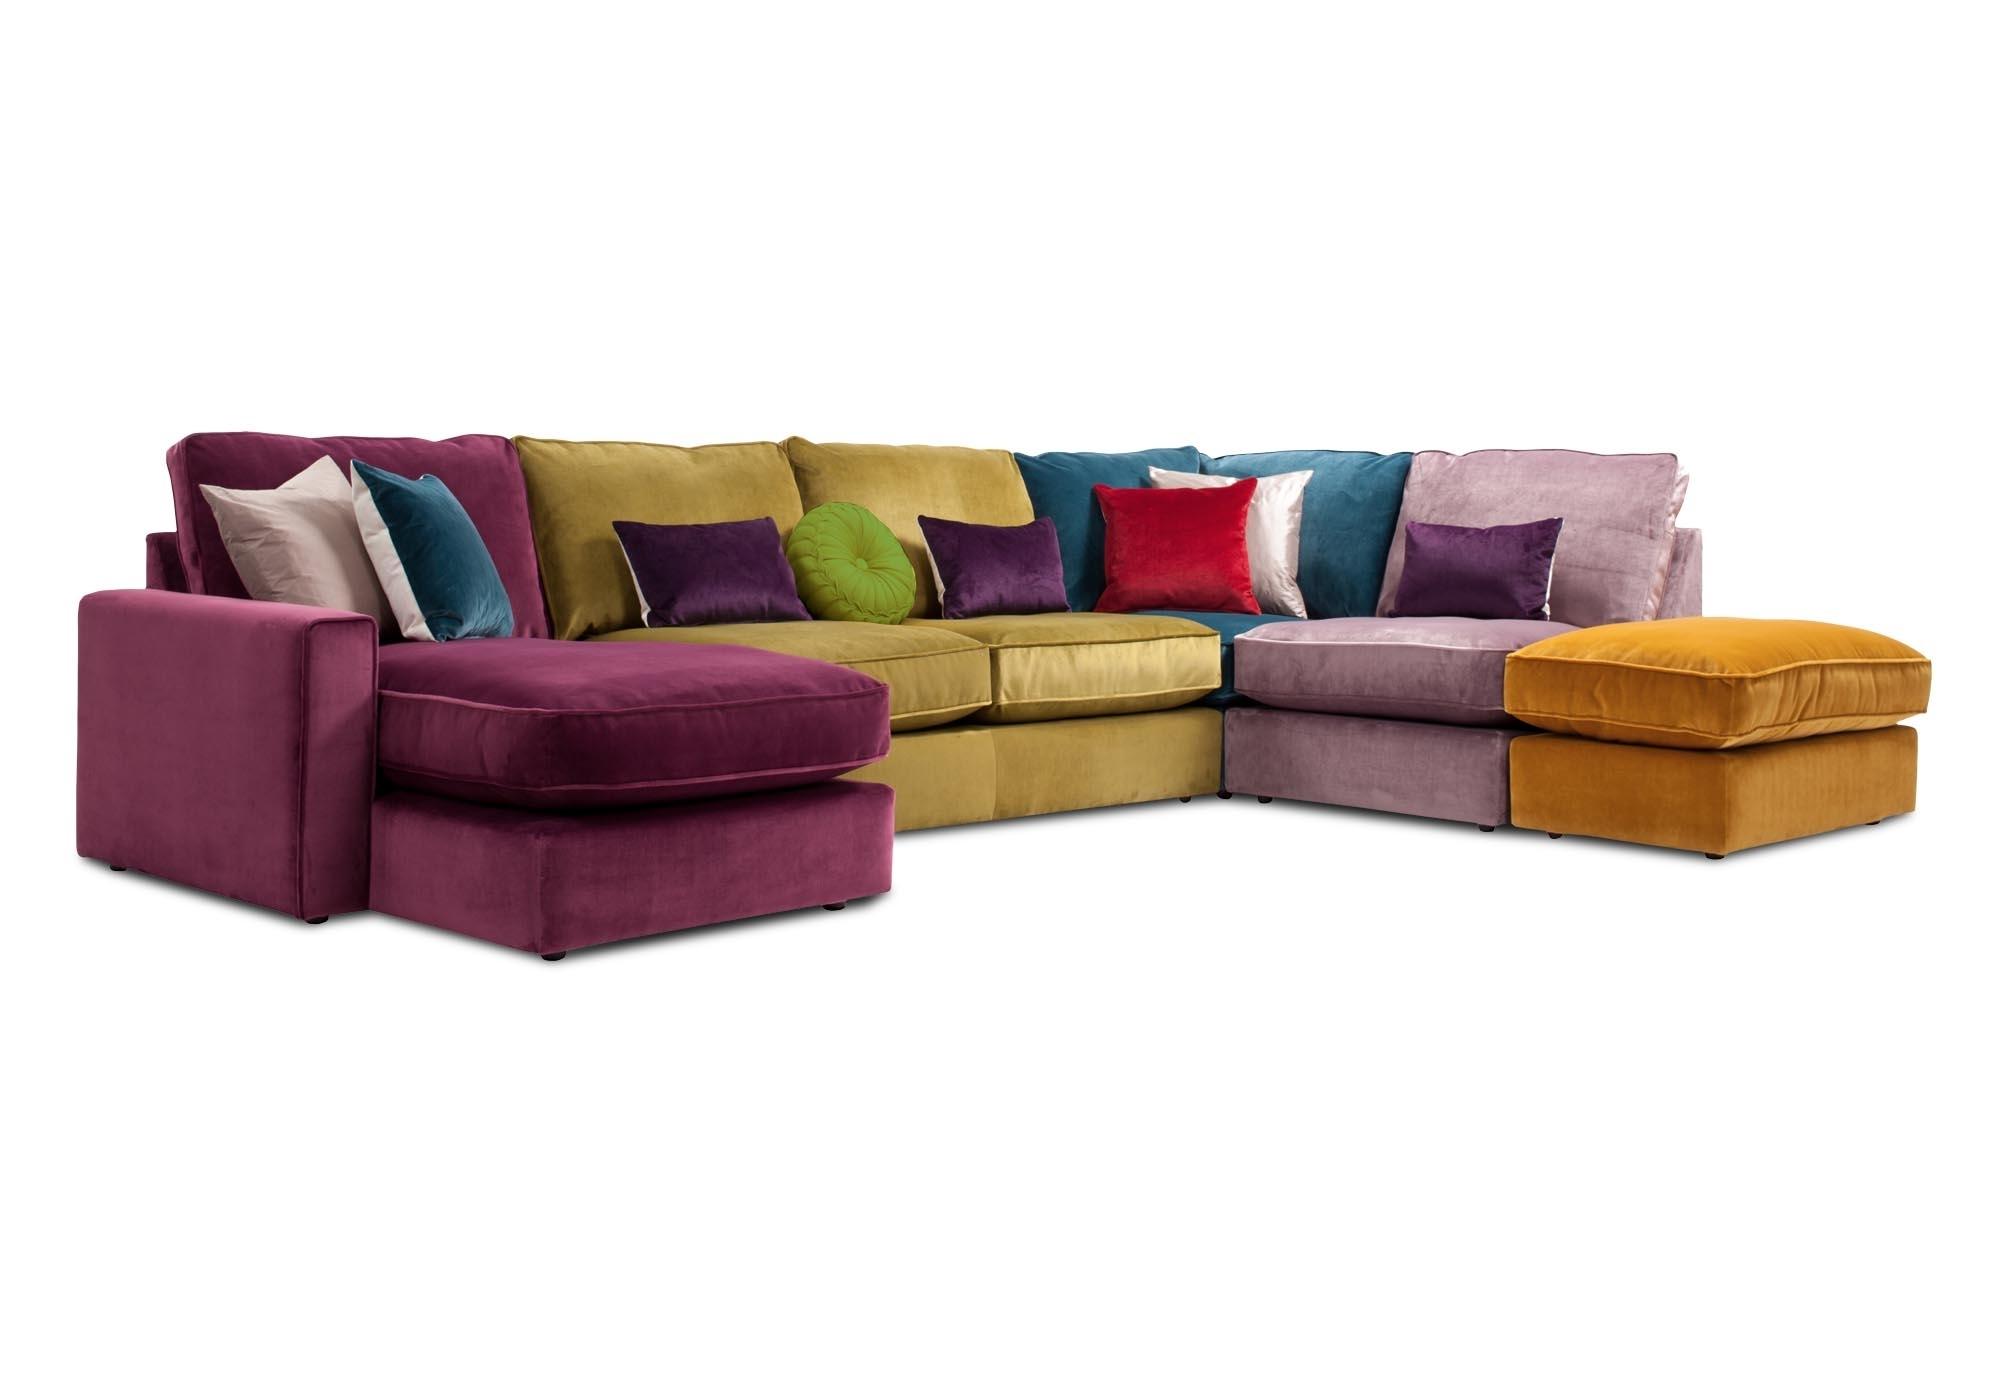 Harlequin Lhf 5 Seater Corner Sofa At Furniture Village Regarding Corner Sofa Chairs (Image 10 of 15)